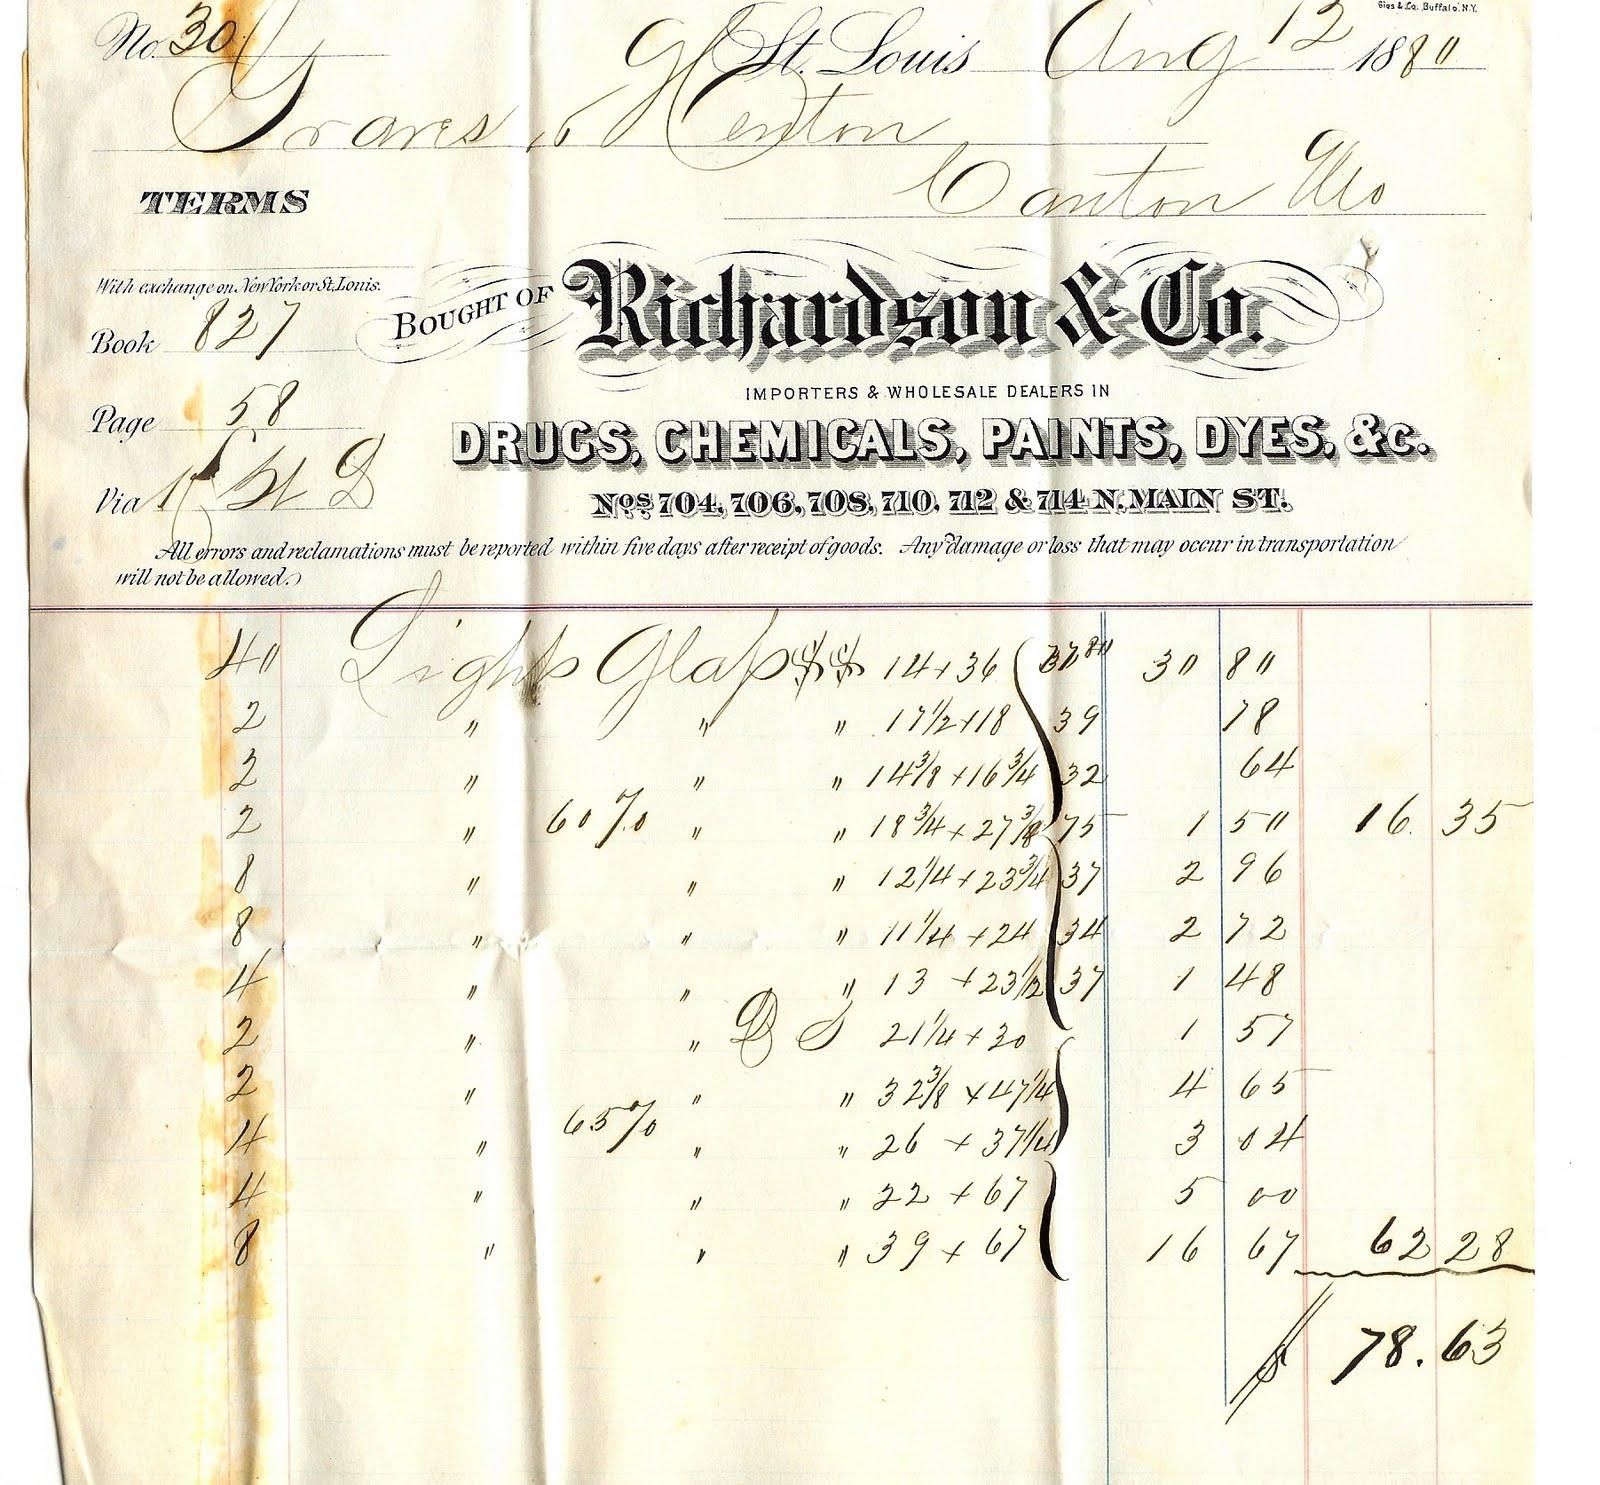 THE EPHEMERA OF BUSINESS: Gies & Co. Buffalo NY Billheads